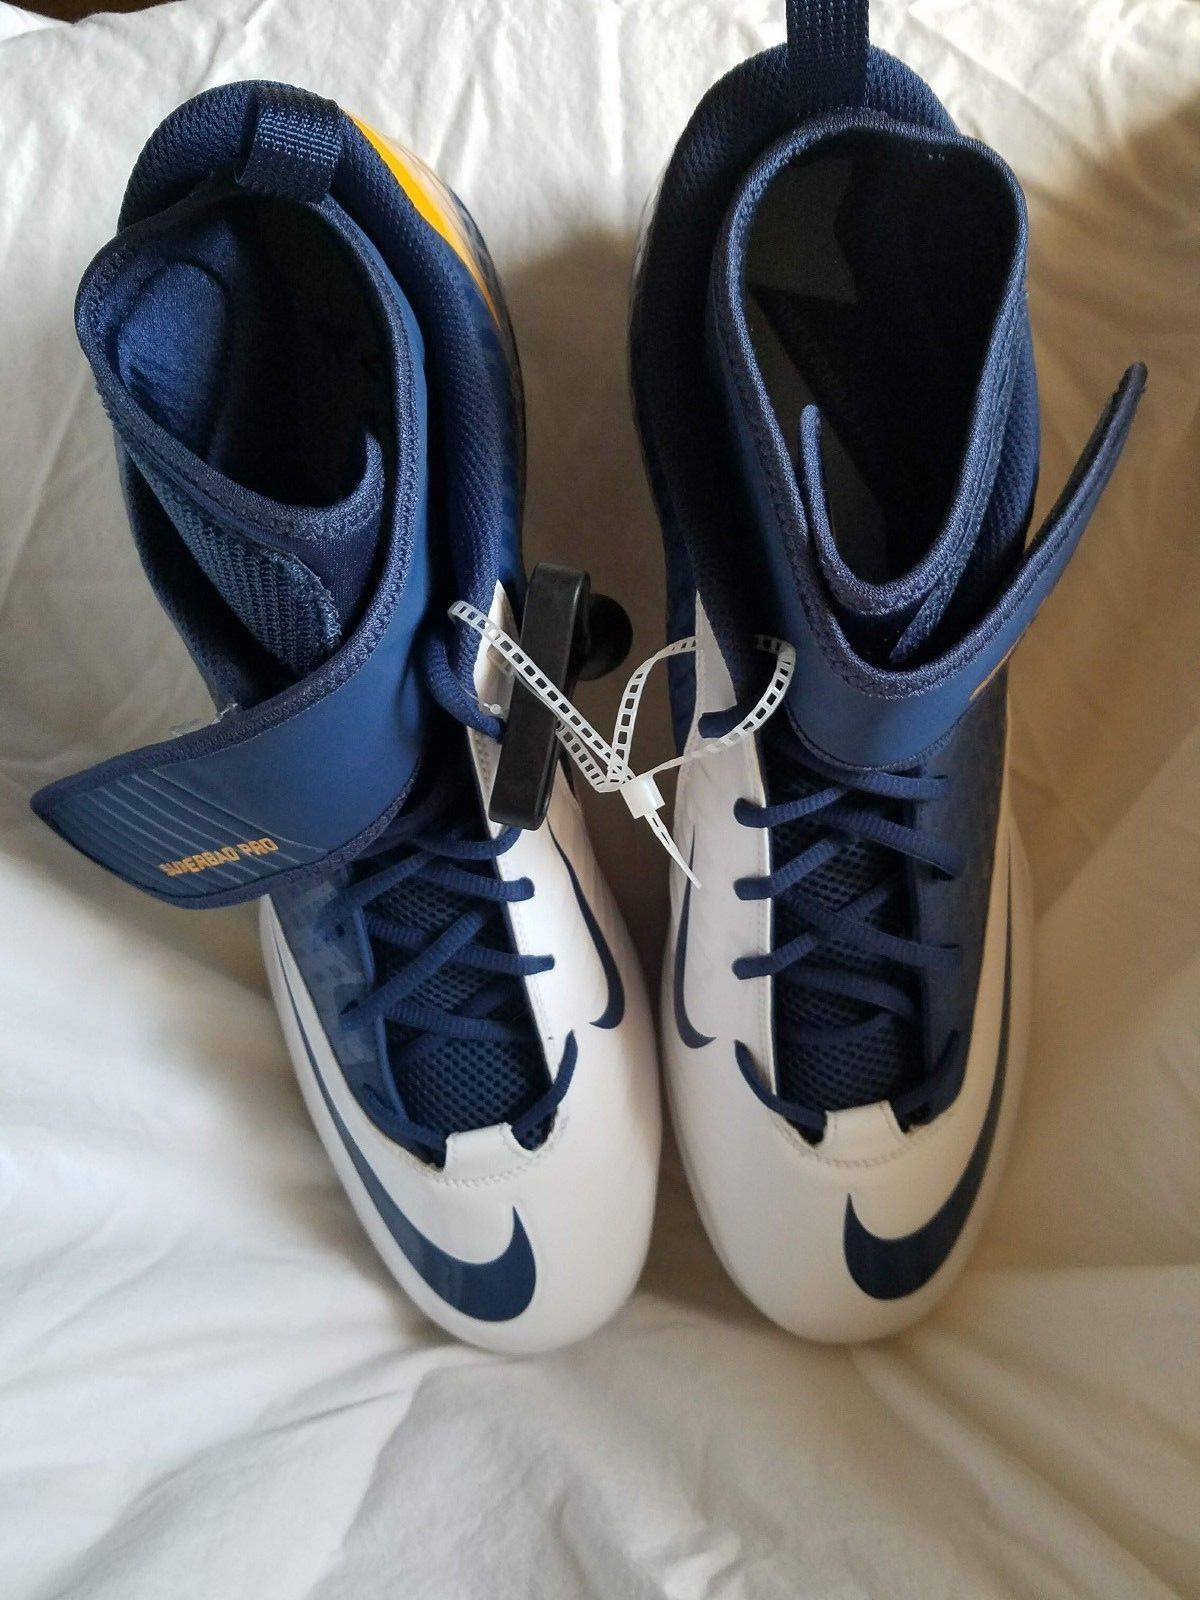 0695ffdf434 Mens Football Cleats Nike Superbad Pro Lunarlon White Blue Size 17